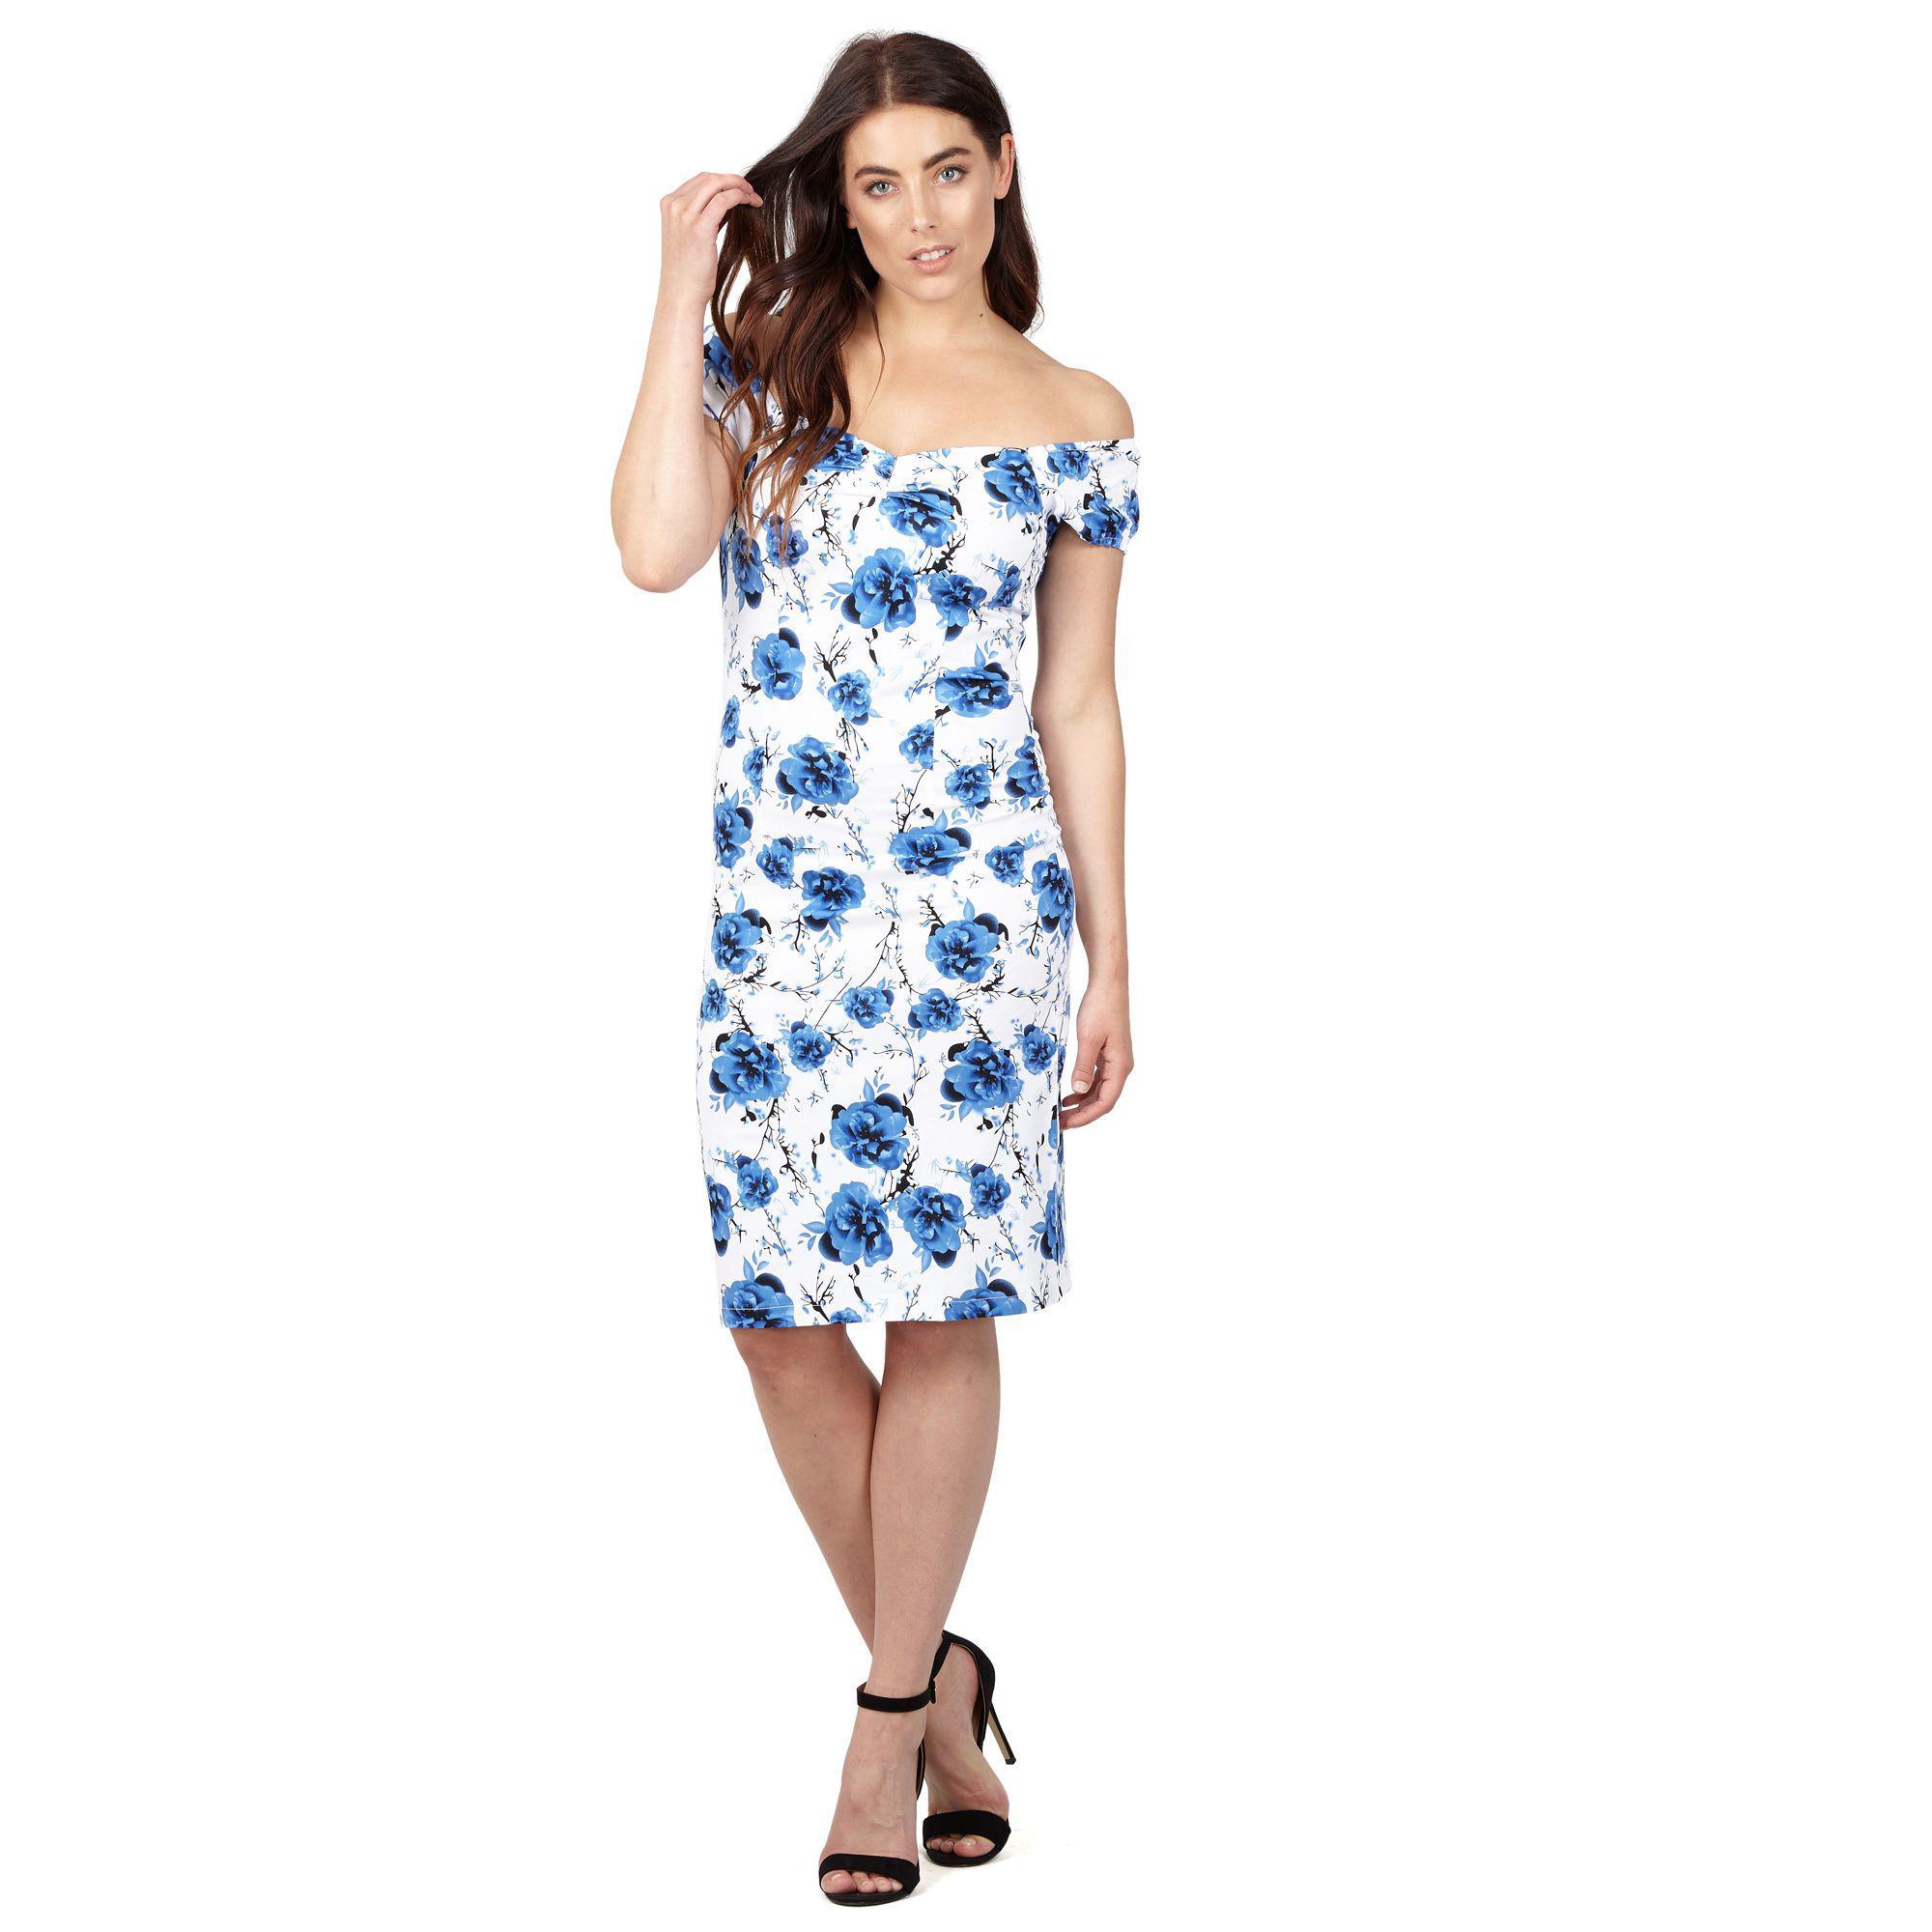 953f961e6fa Izabel London Blue Floral Print Shift Dress in Blue - Lyst